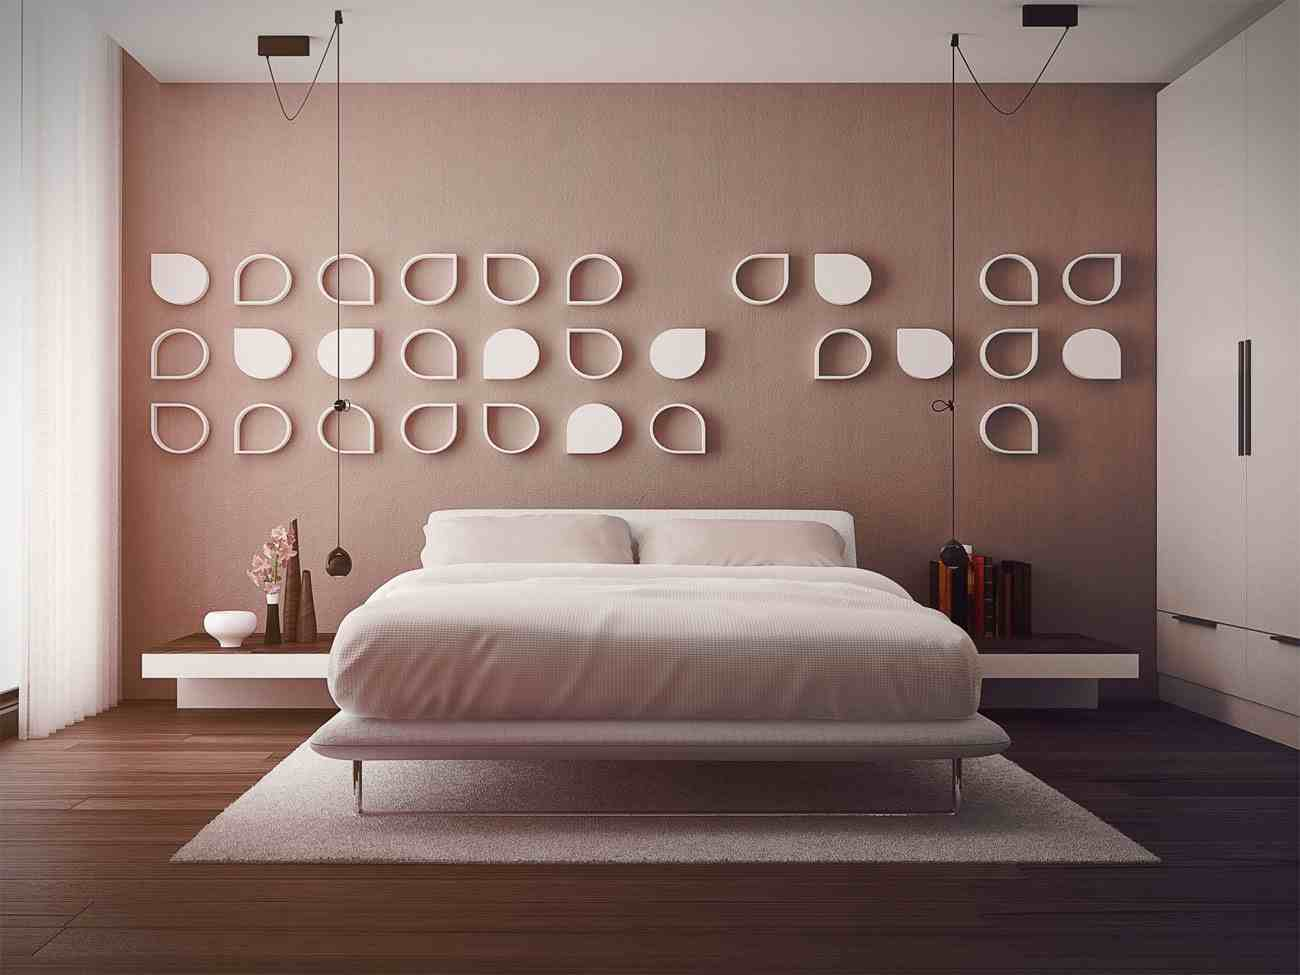 inspirasi desain interior kamar tidur simpel modern - dinerbacklot